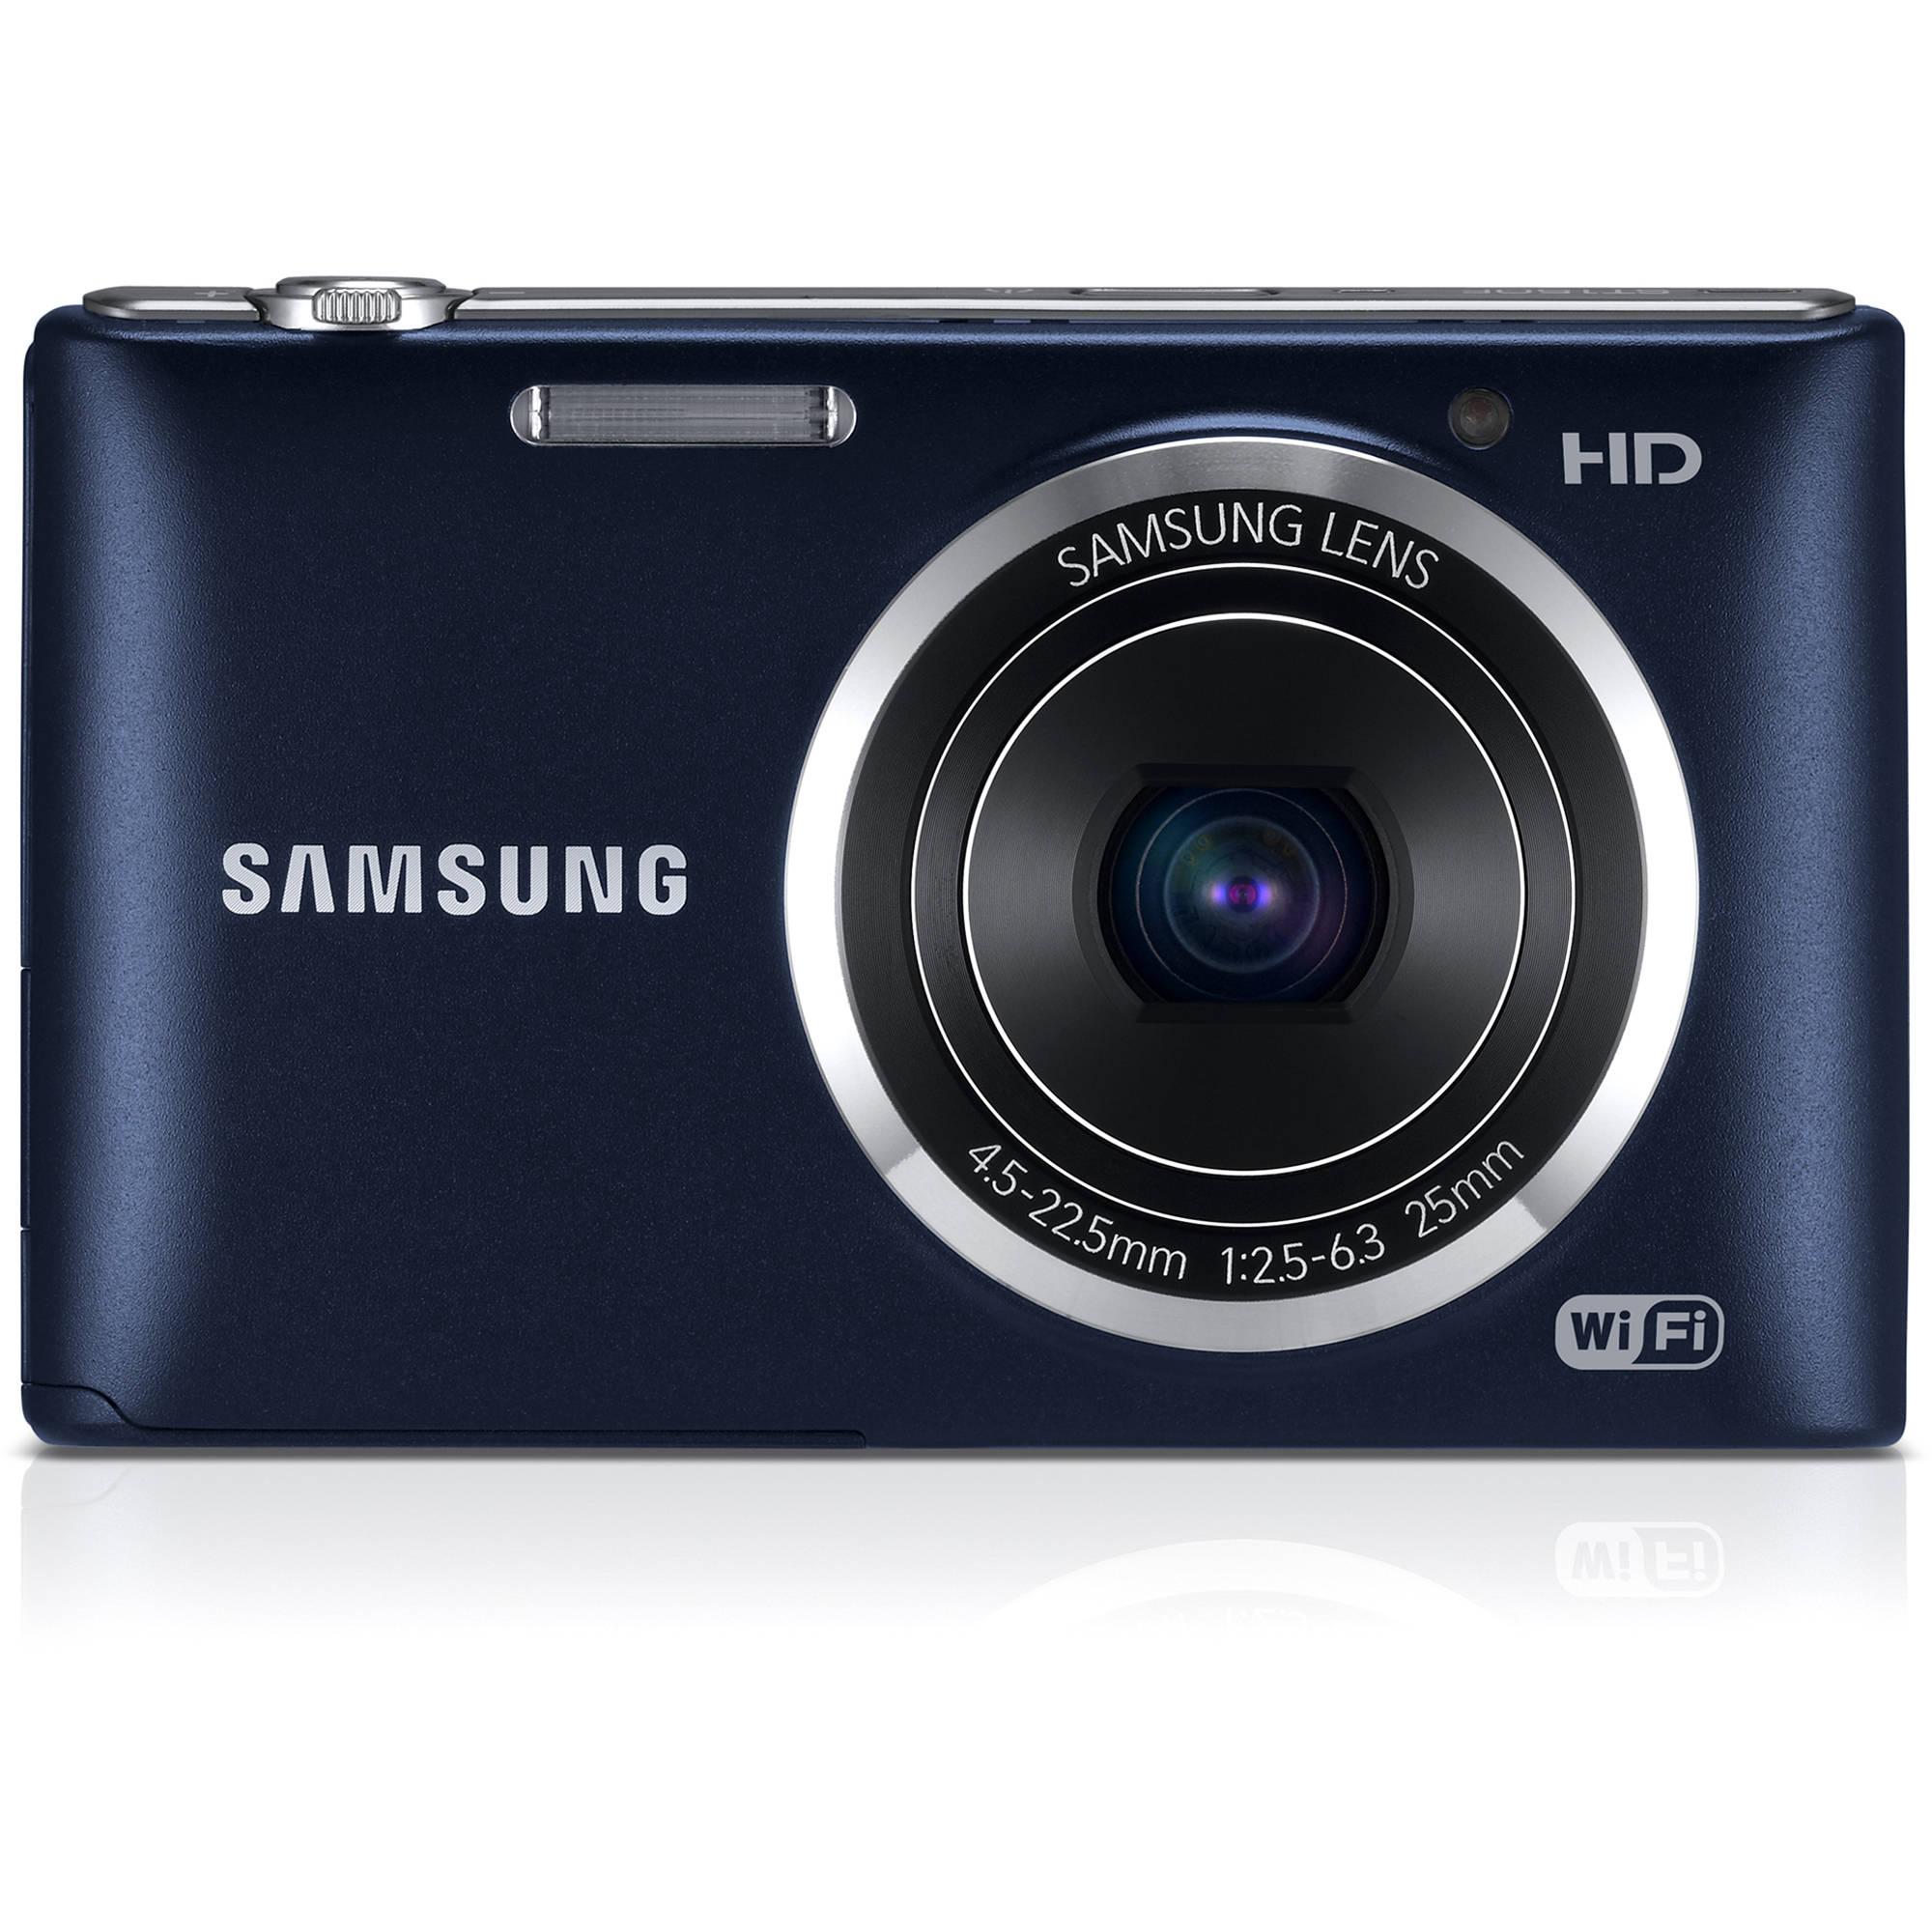 ST150F Smart Digital Camera (Cobalt Black)